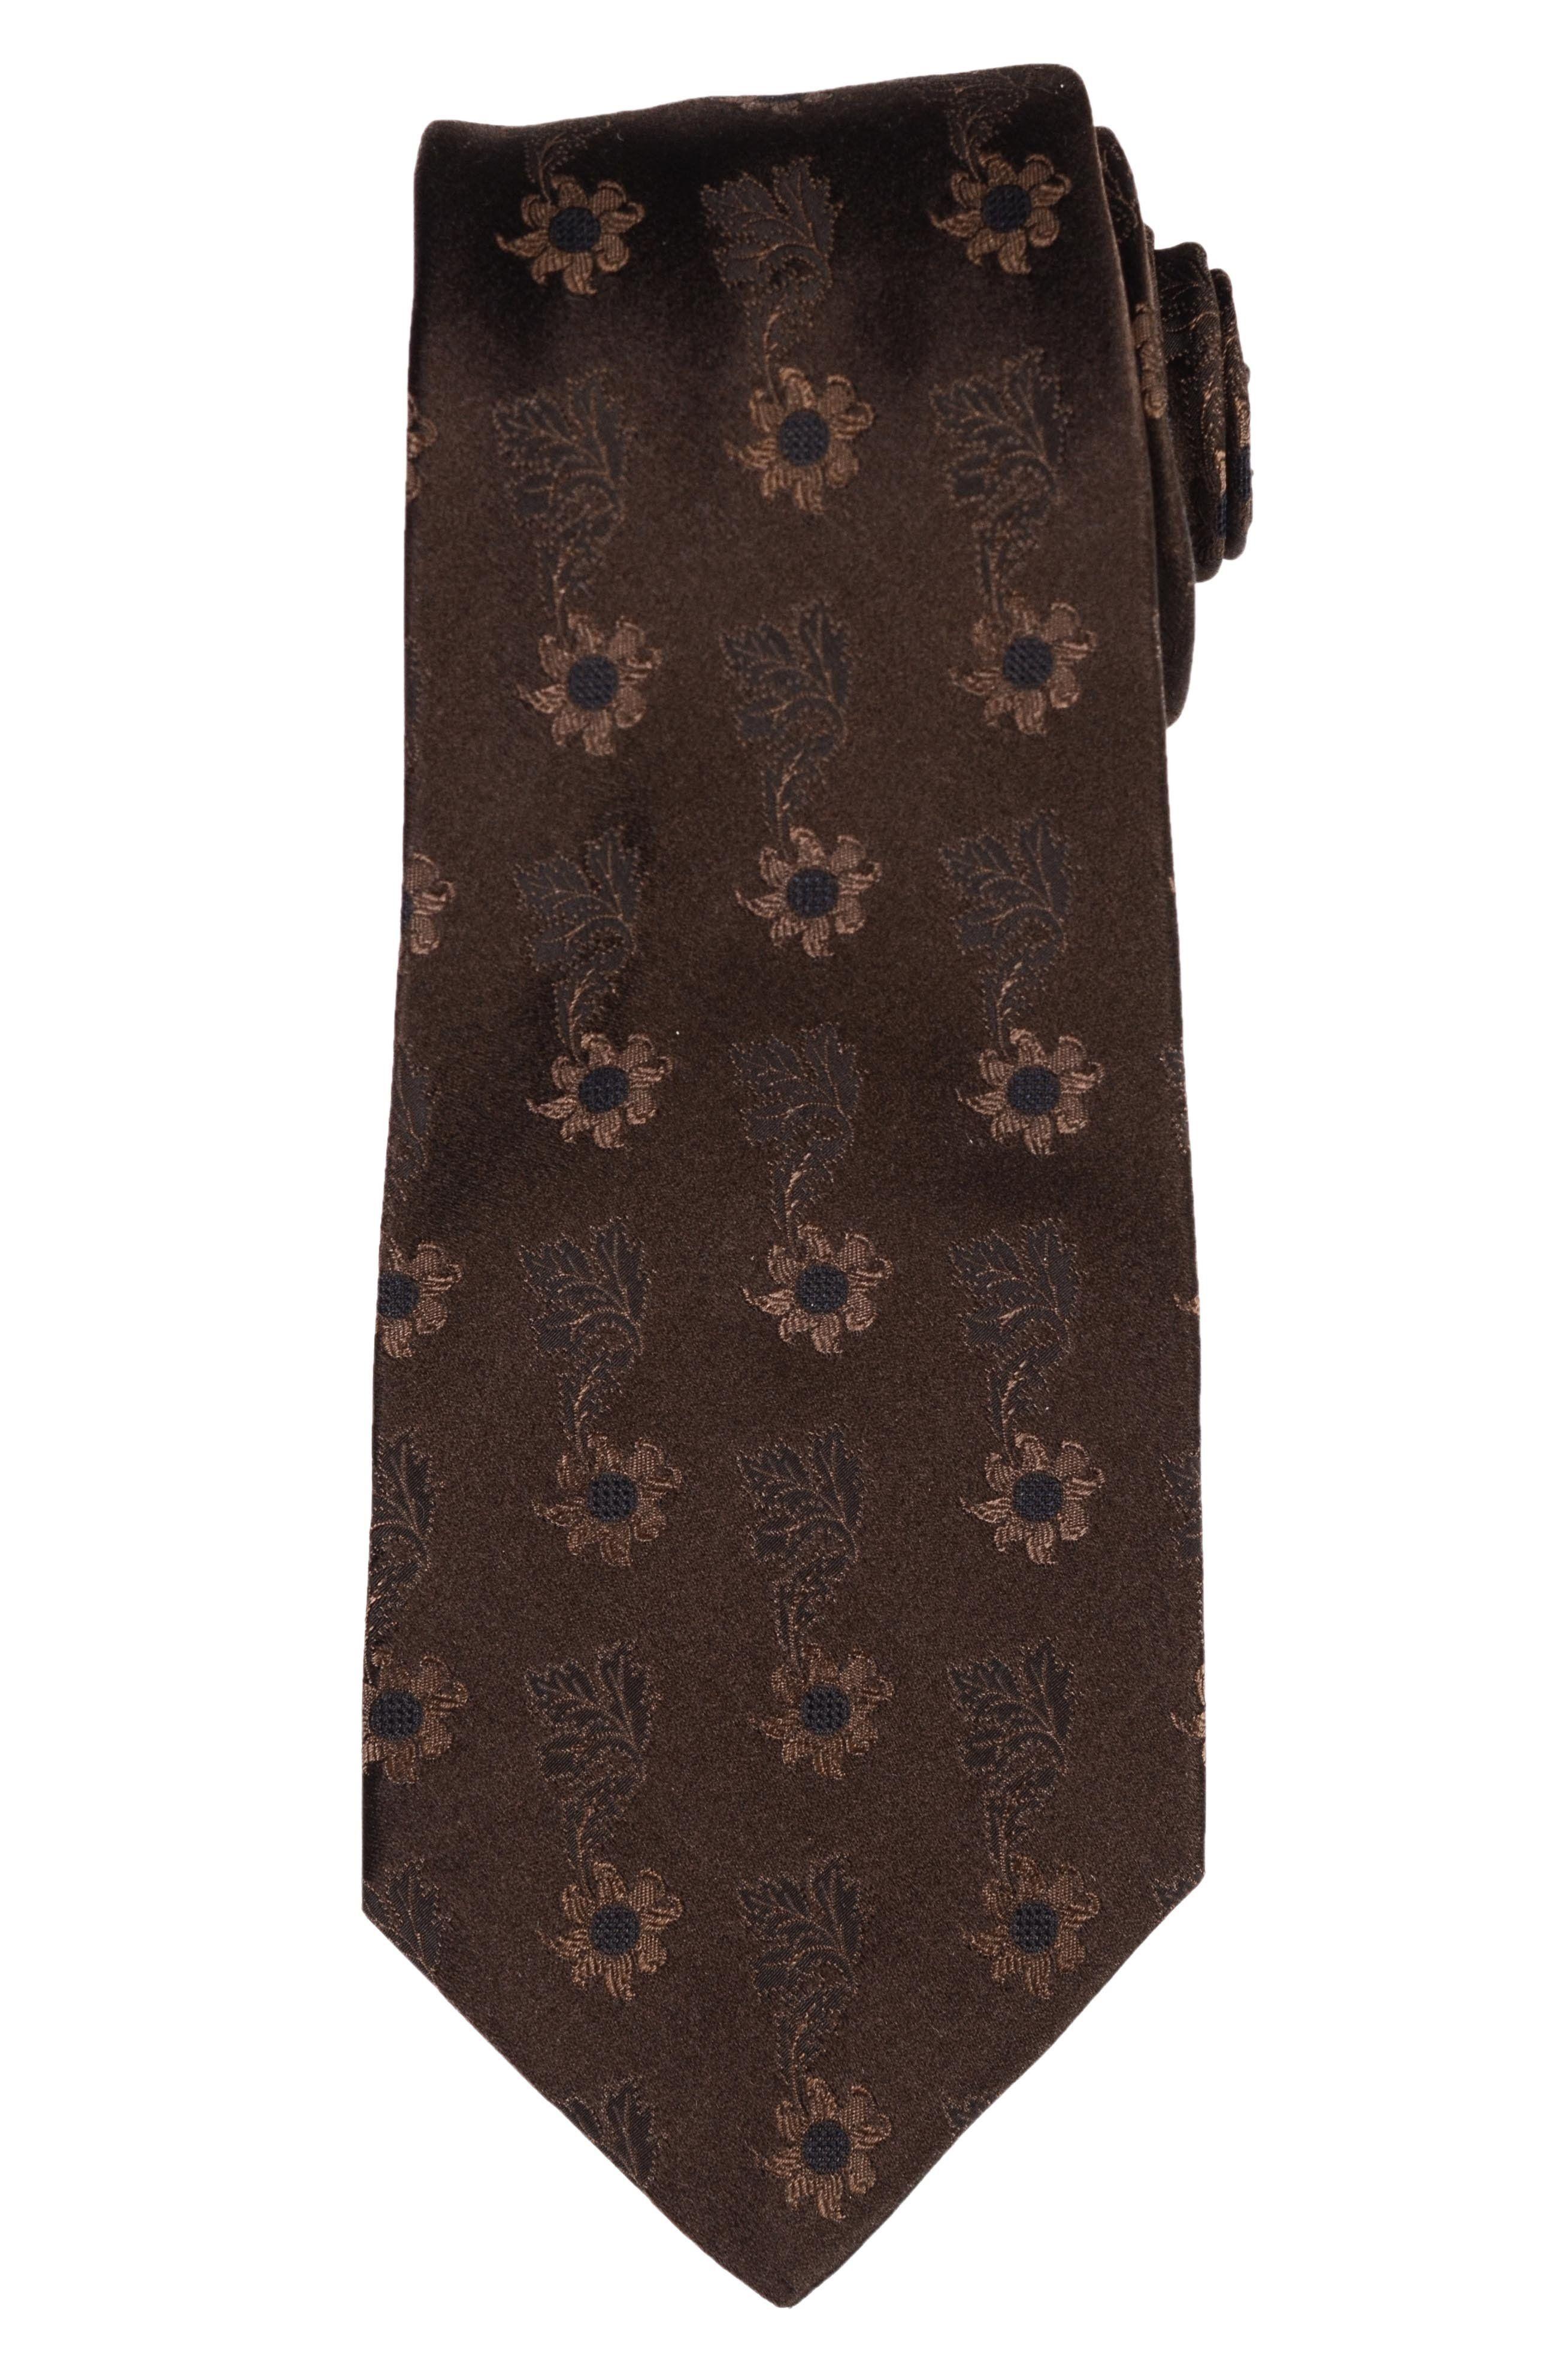 KITON Napoli Hand-Made Seven Fold Burgundy Silk Tie NEW